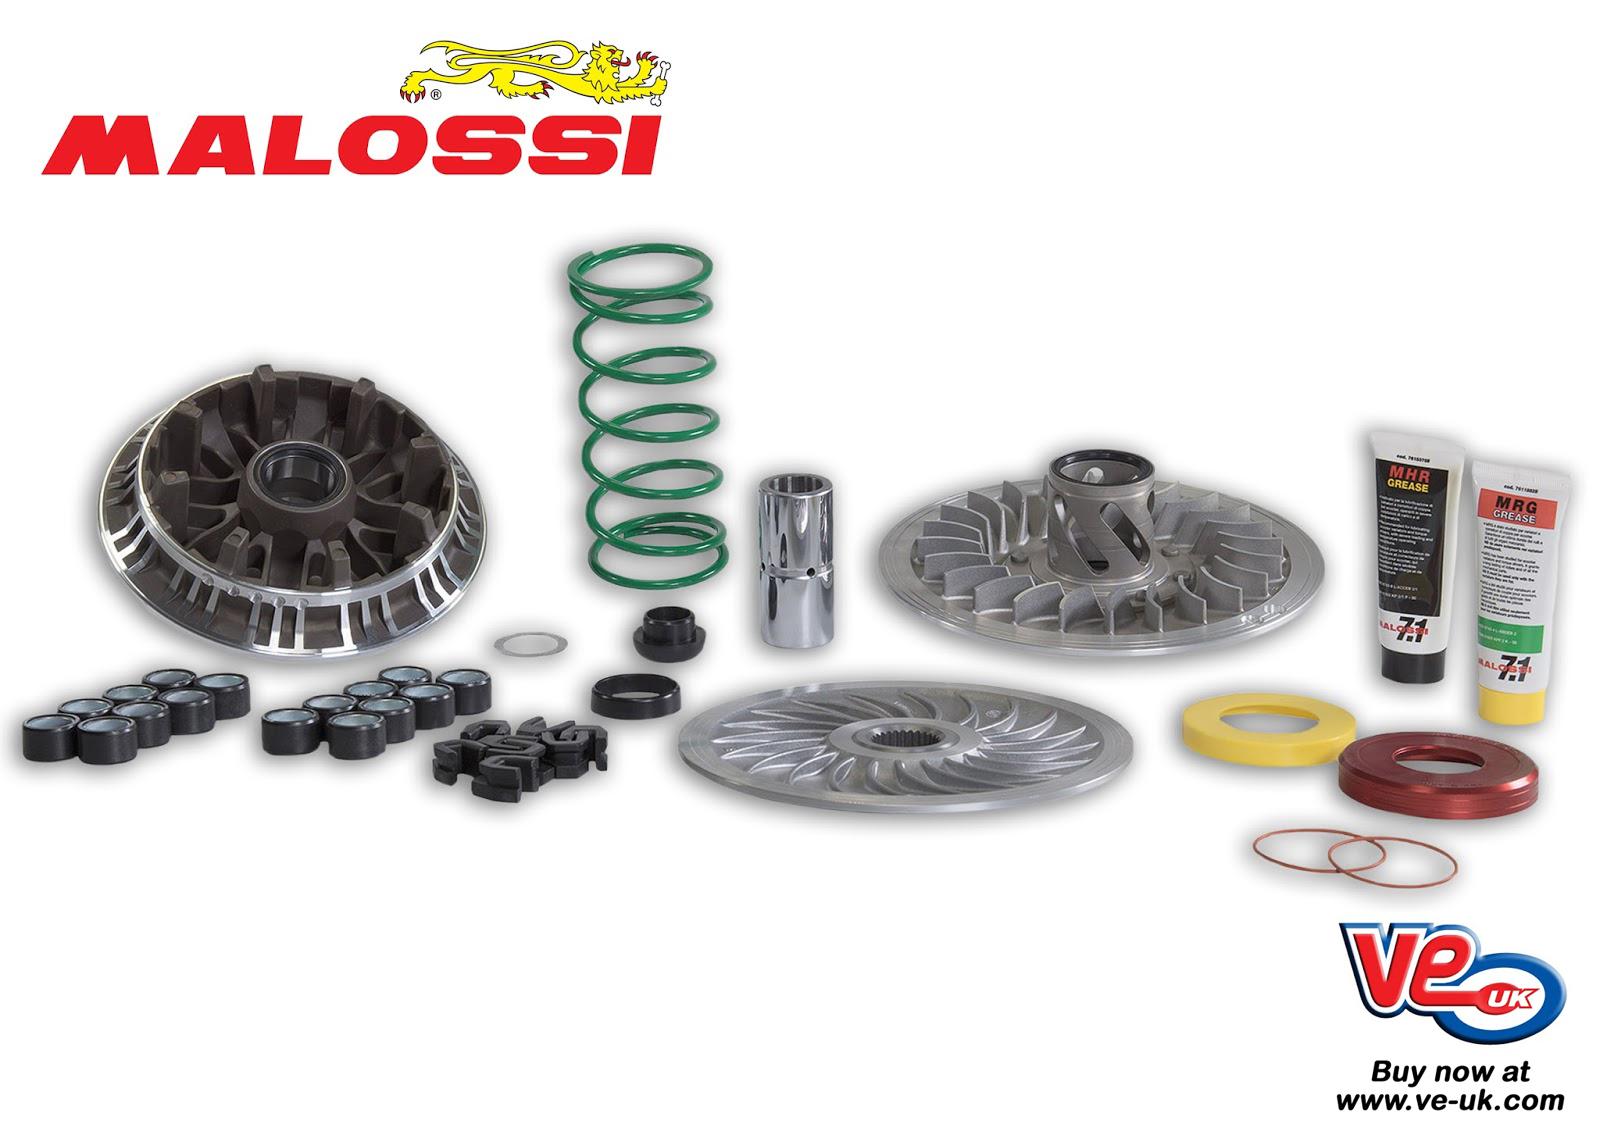 Malossi Over Range Kit for Yamaha T-Max 530